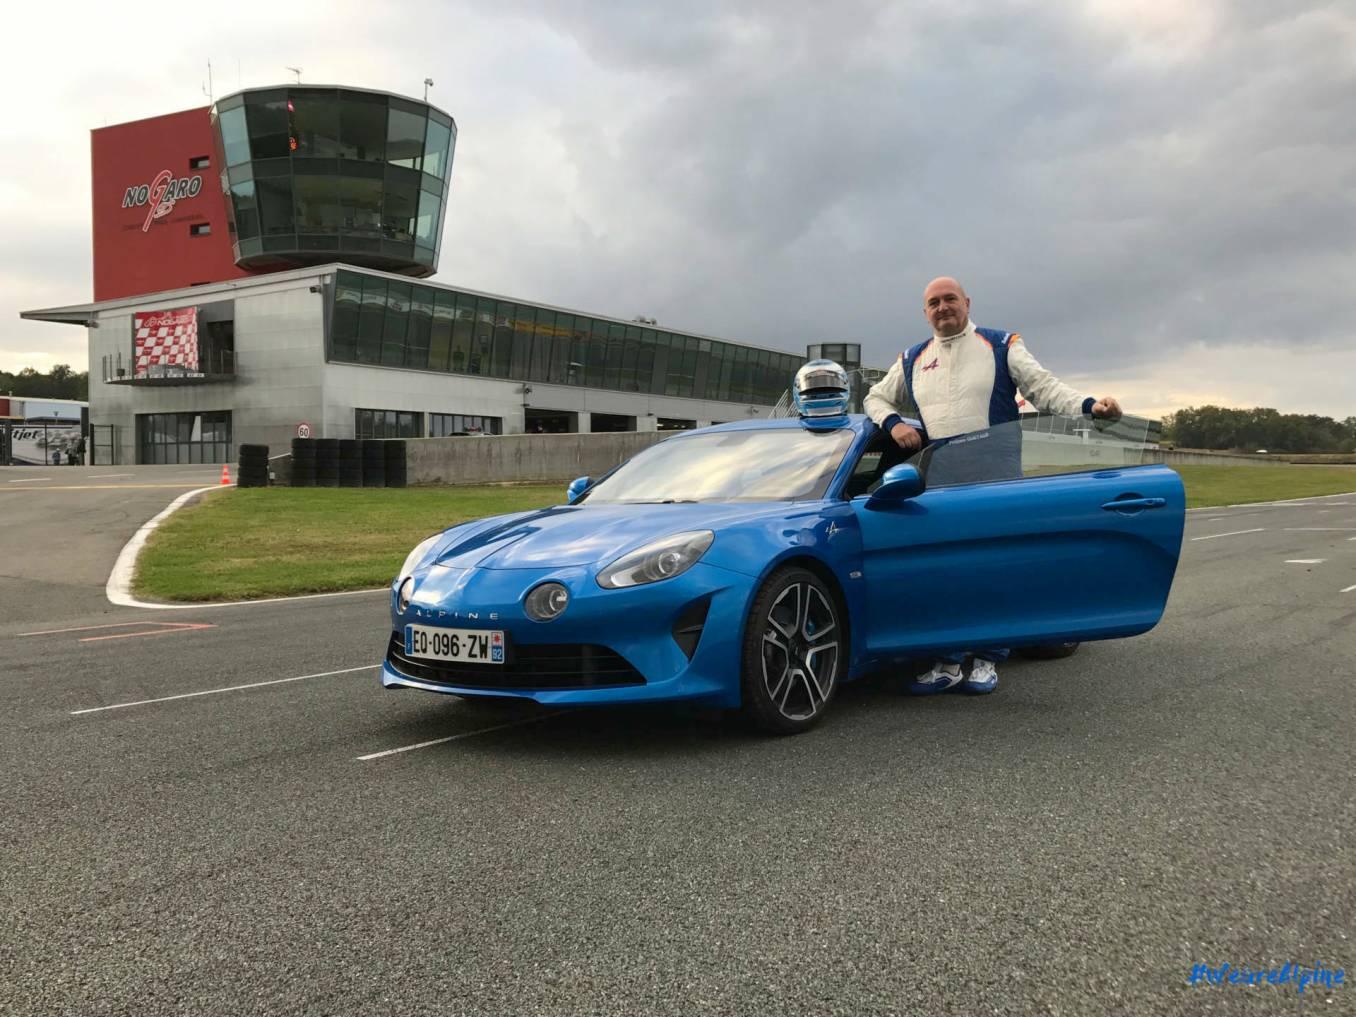 Alpine A110 2017 Philippe Quetaud Circuit Nogaro Première immatriculation 1   La première Alpine A110 immatriculée sur le circuit de Nogaro !